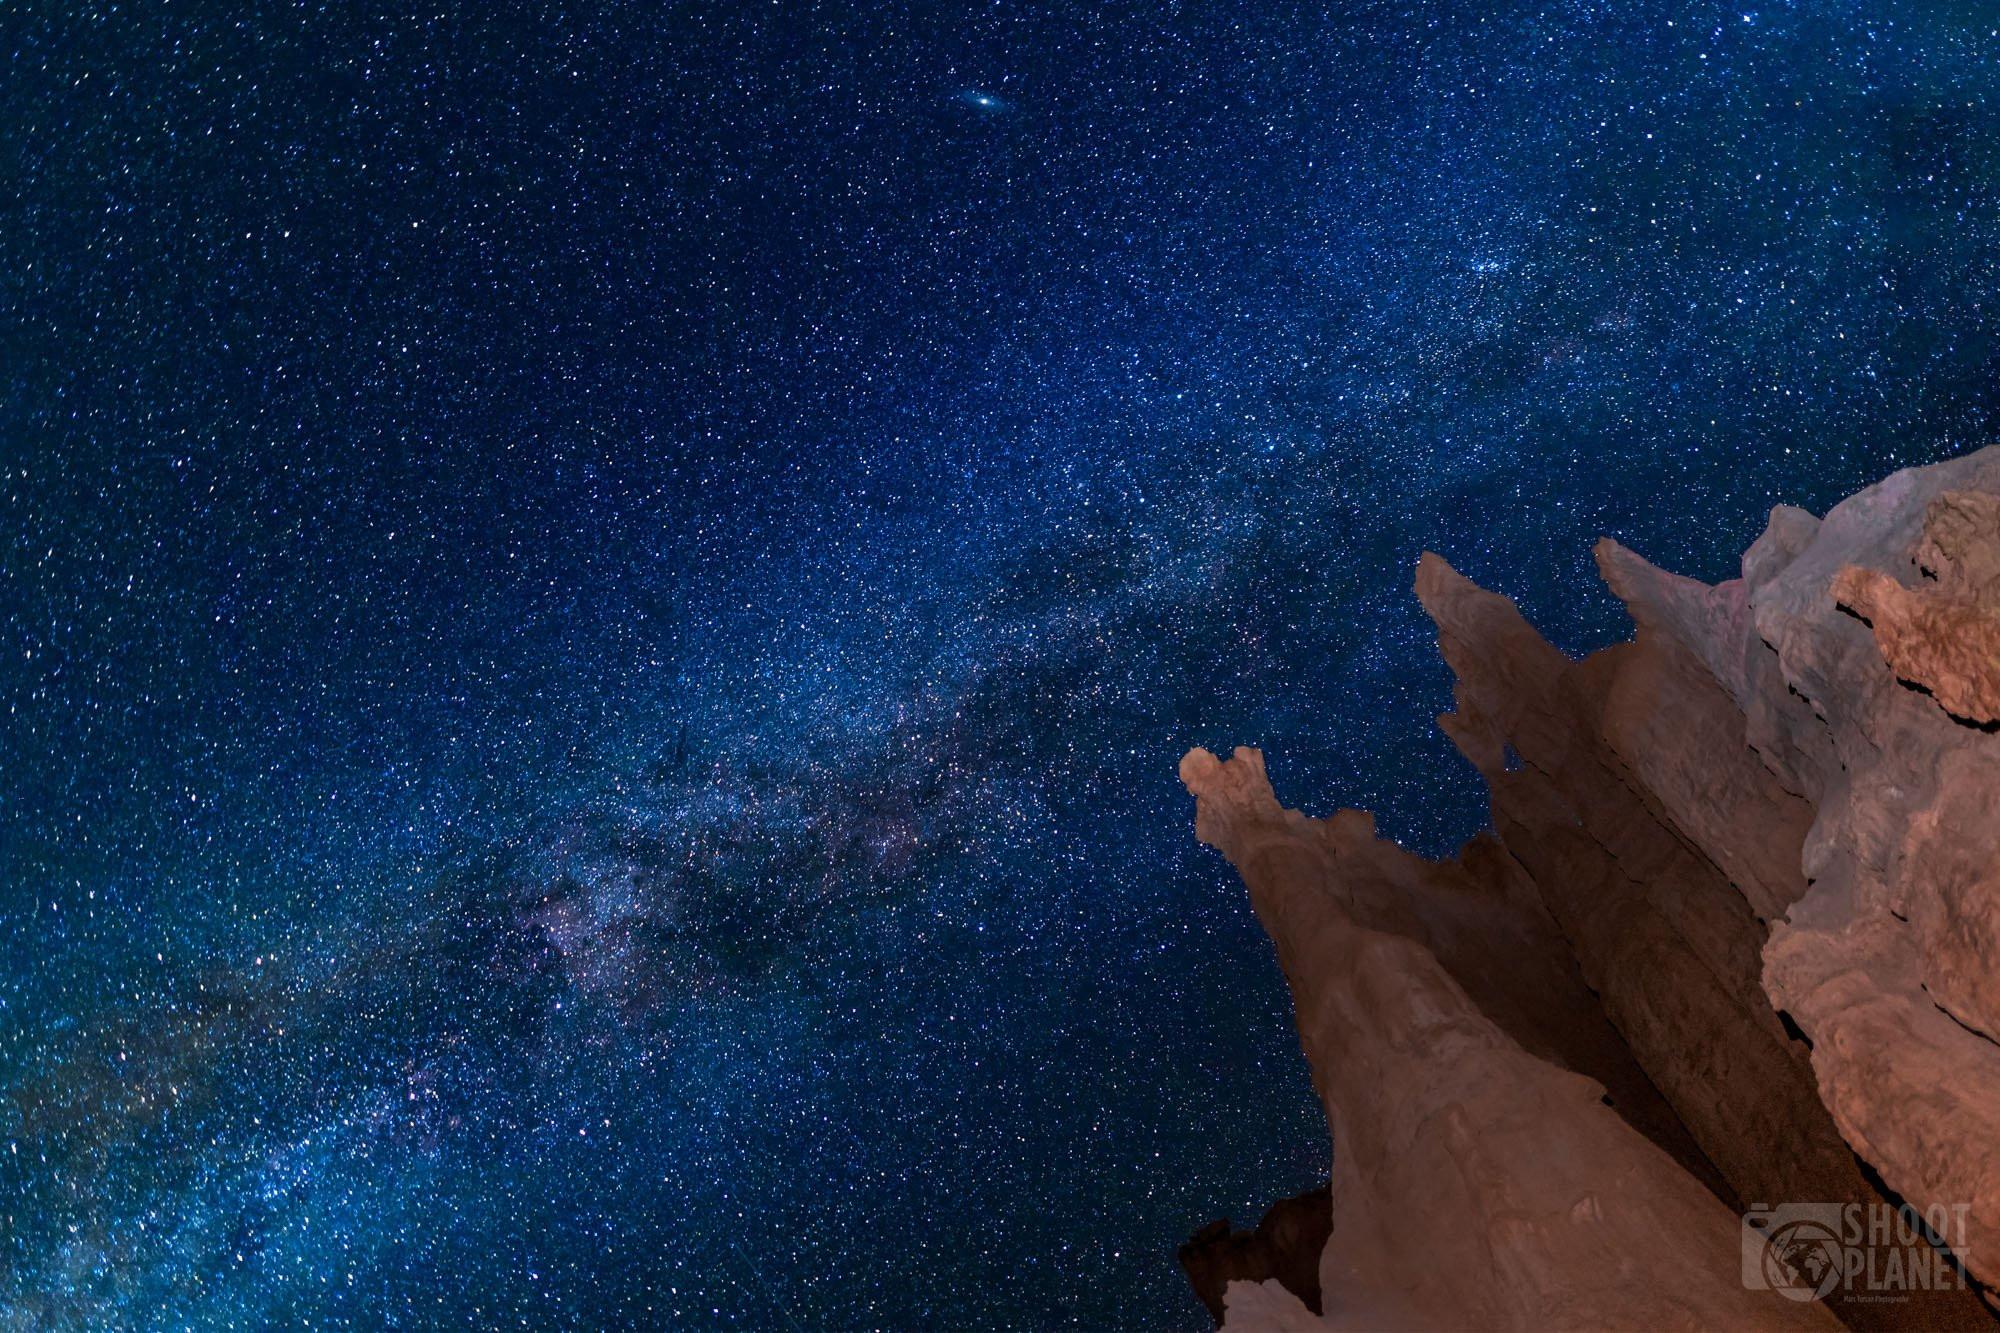 Bryce Canyon Milky Way and lit-up rocks, USA